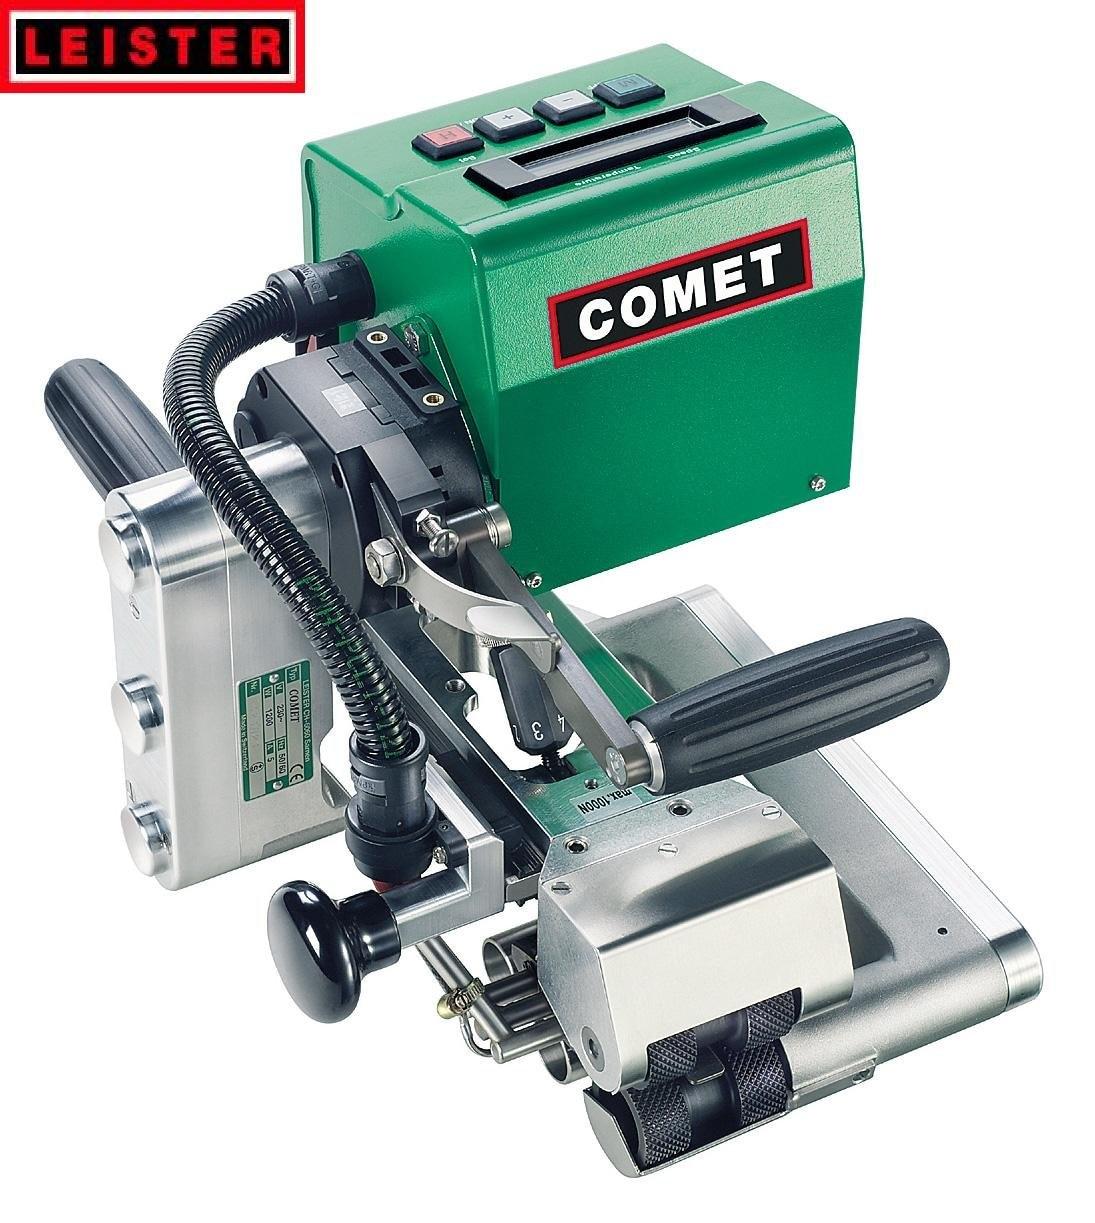 medium resolution of leister plastic welding machine comet